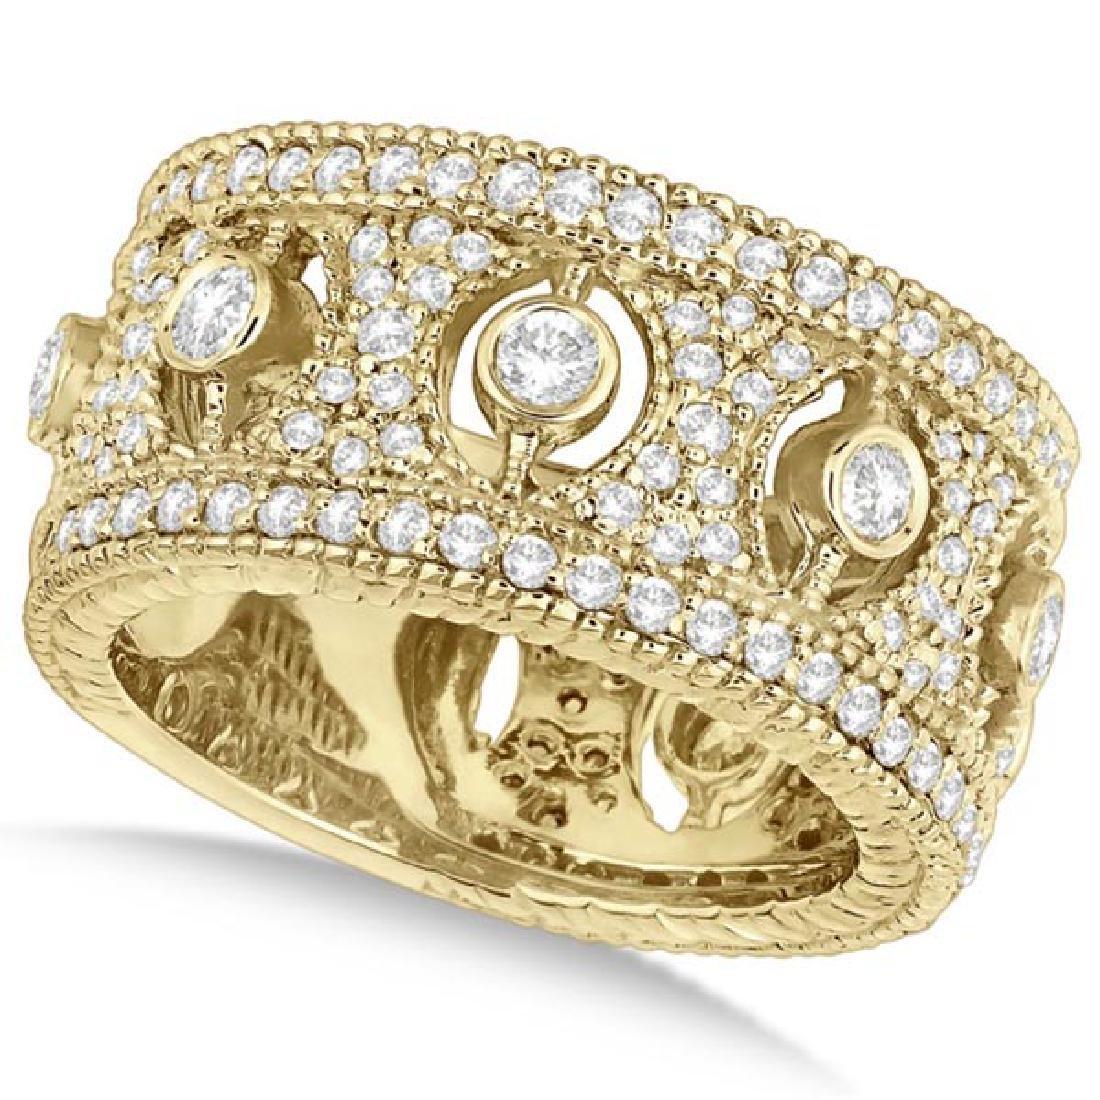 Vintage Bezel-Set Wide Band Diamond Ring 14k Yellow Gol